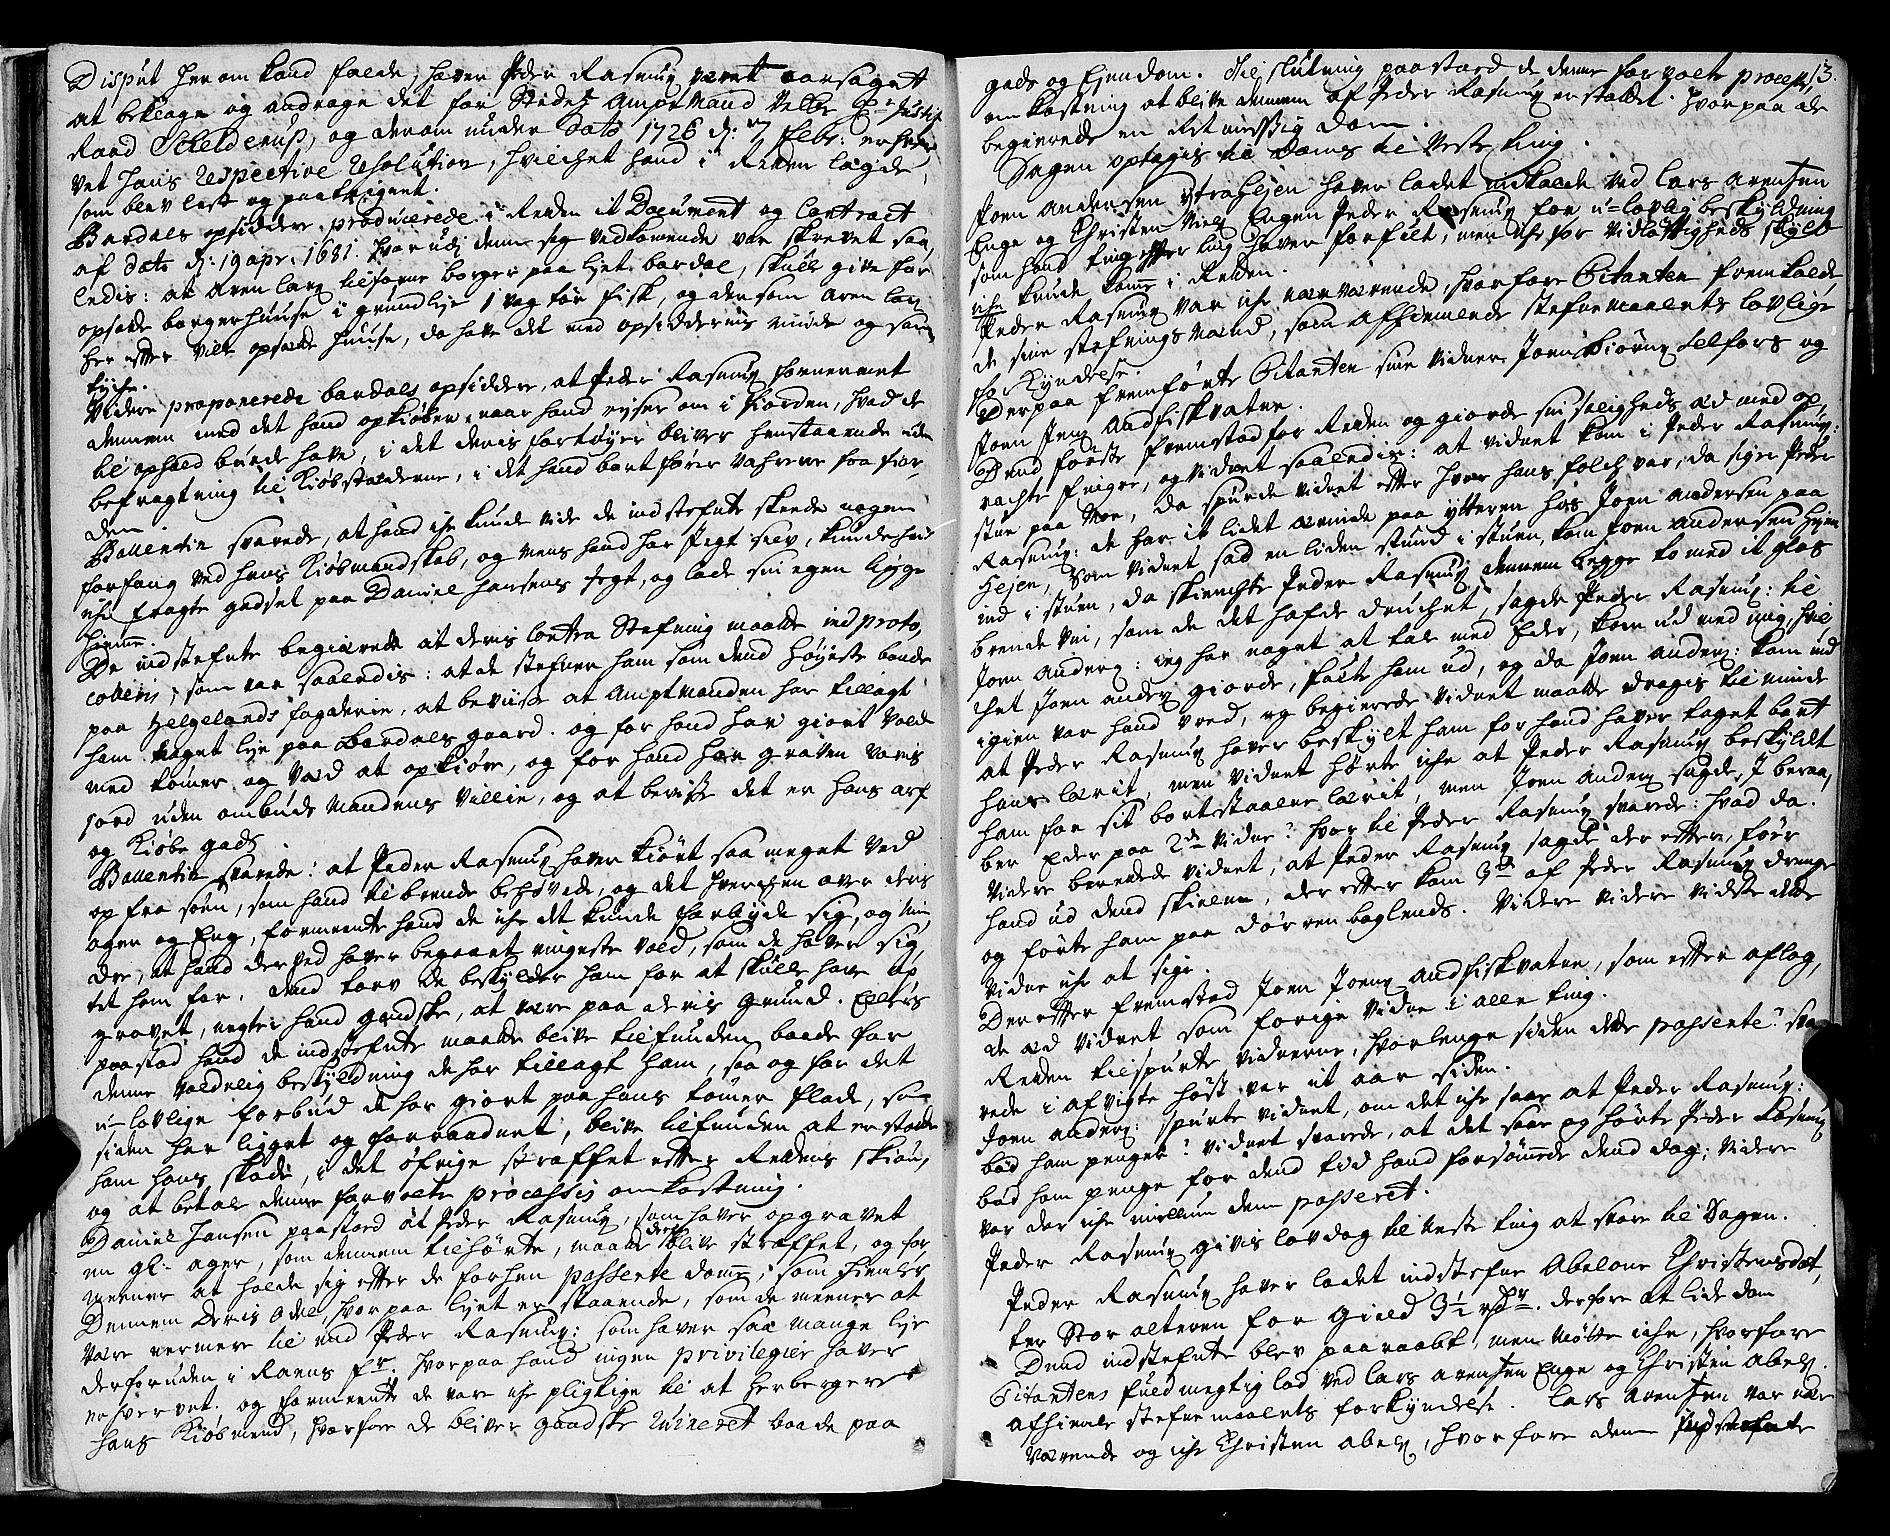 SAT, Helgeland sorenskriveri, 1/1A/L0007: Tingbok 8, 1726-1730, s. 12b-13a